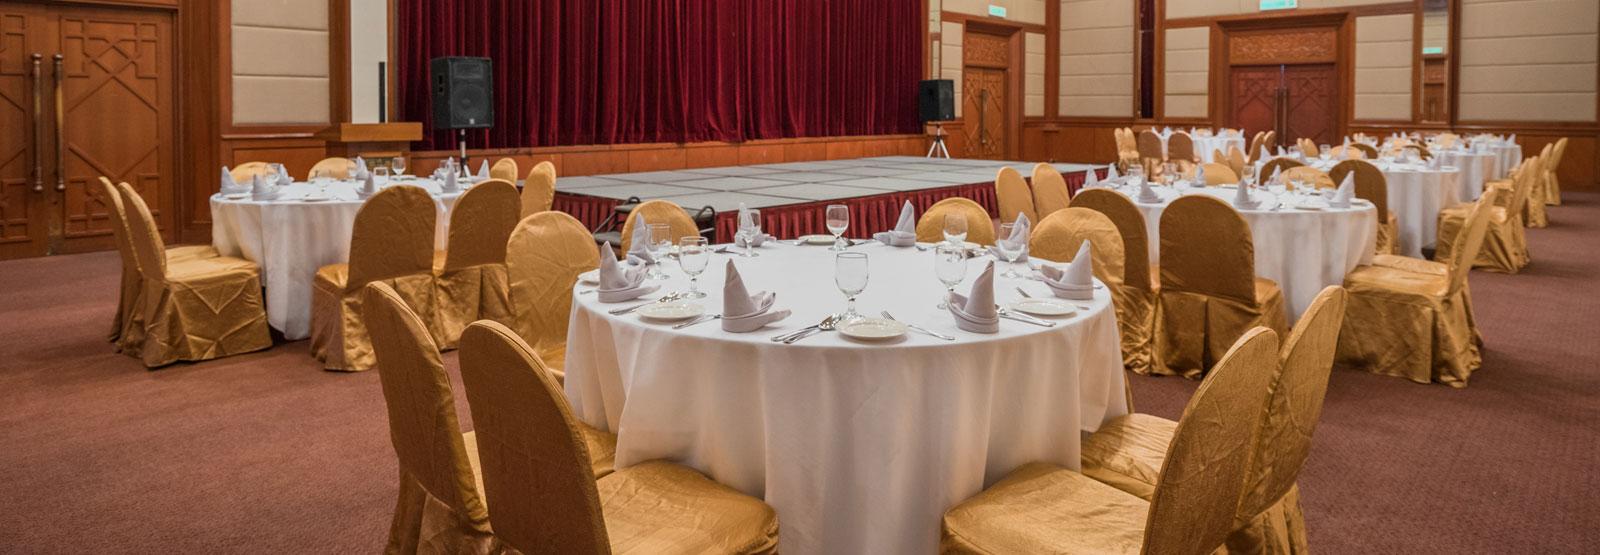 Shahzan Hall Ballroom